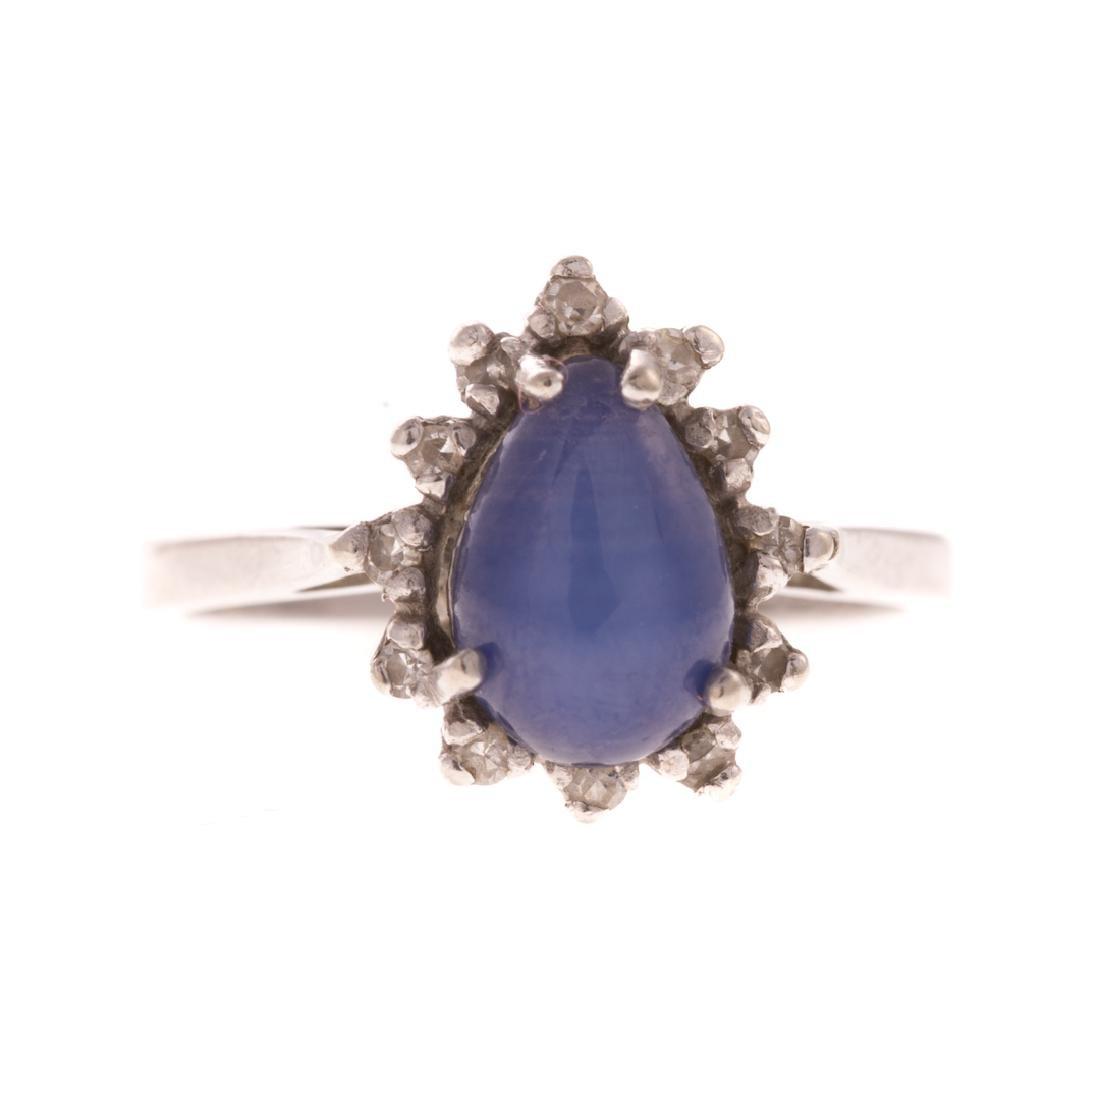 A Lady's White Gold Diamond Bracelet & Ring - 5